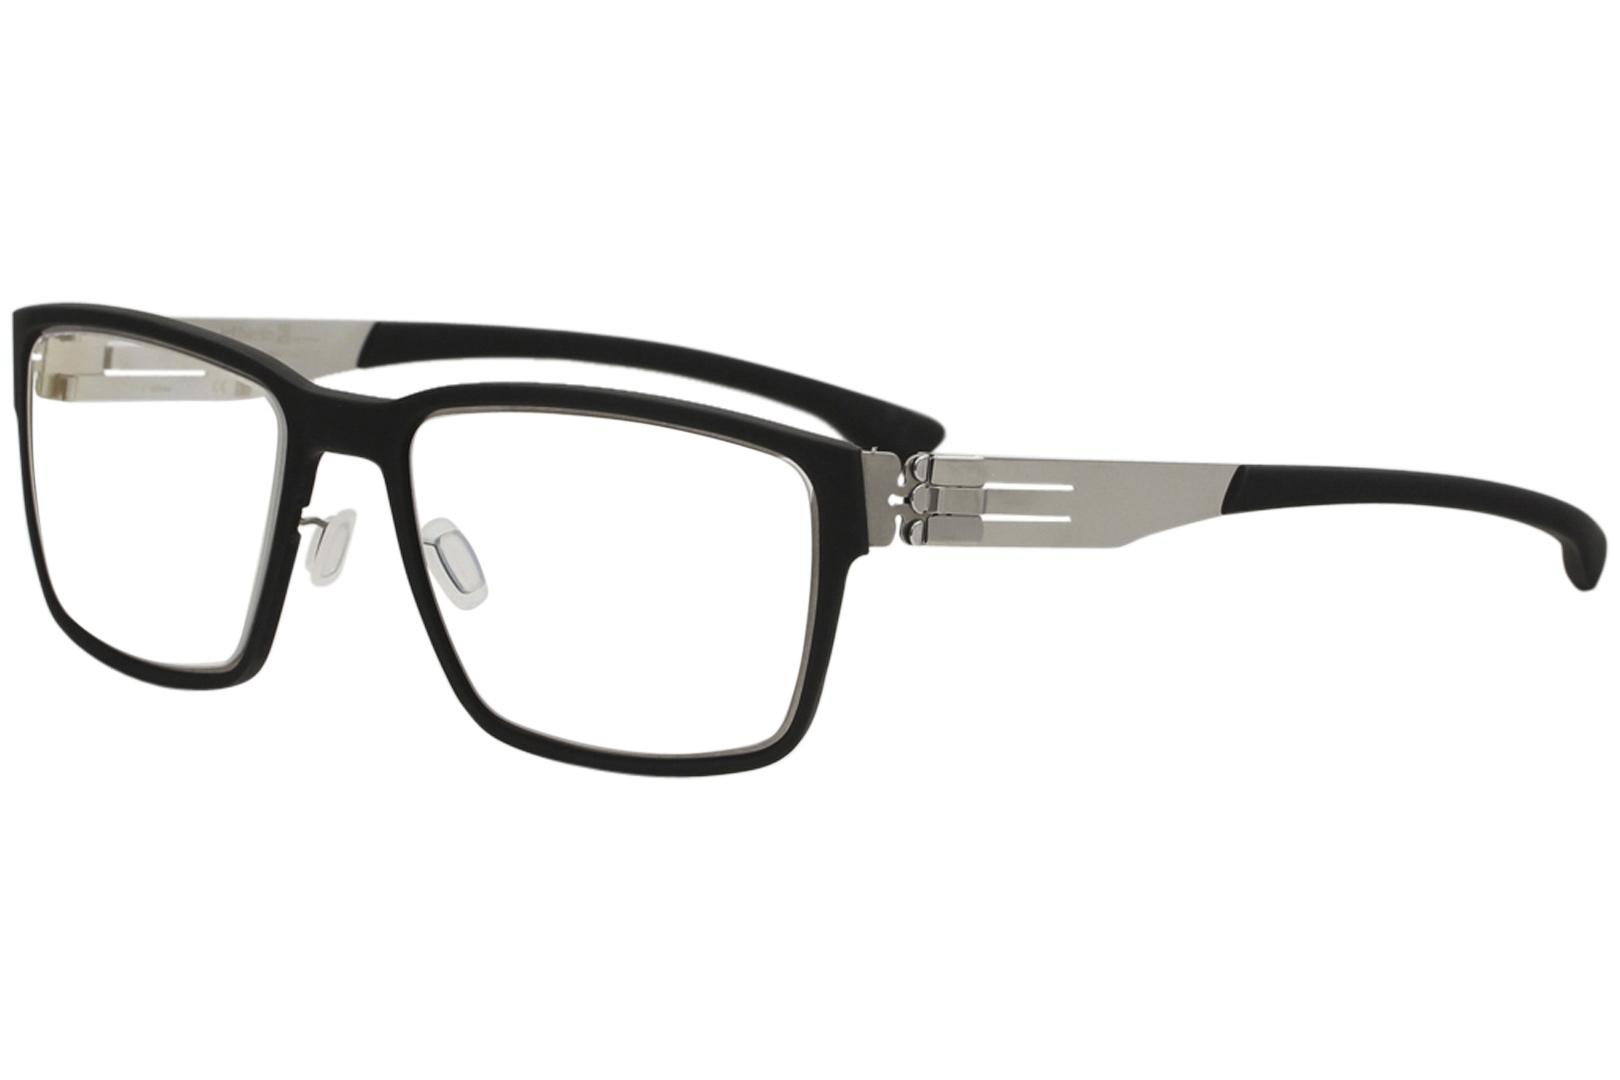 Image of Ic! Berlin Men's Eyeglasses Nino S. Full Rim Optical Frame - Black - Lens 53 Bridge 20 Temple 145mm